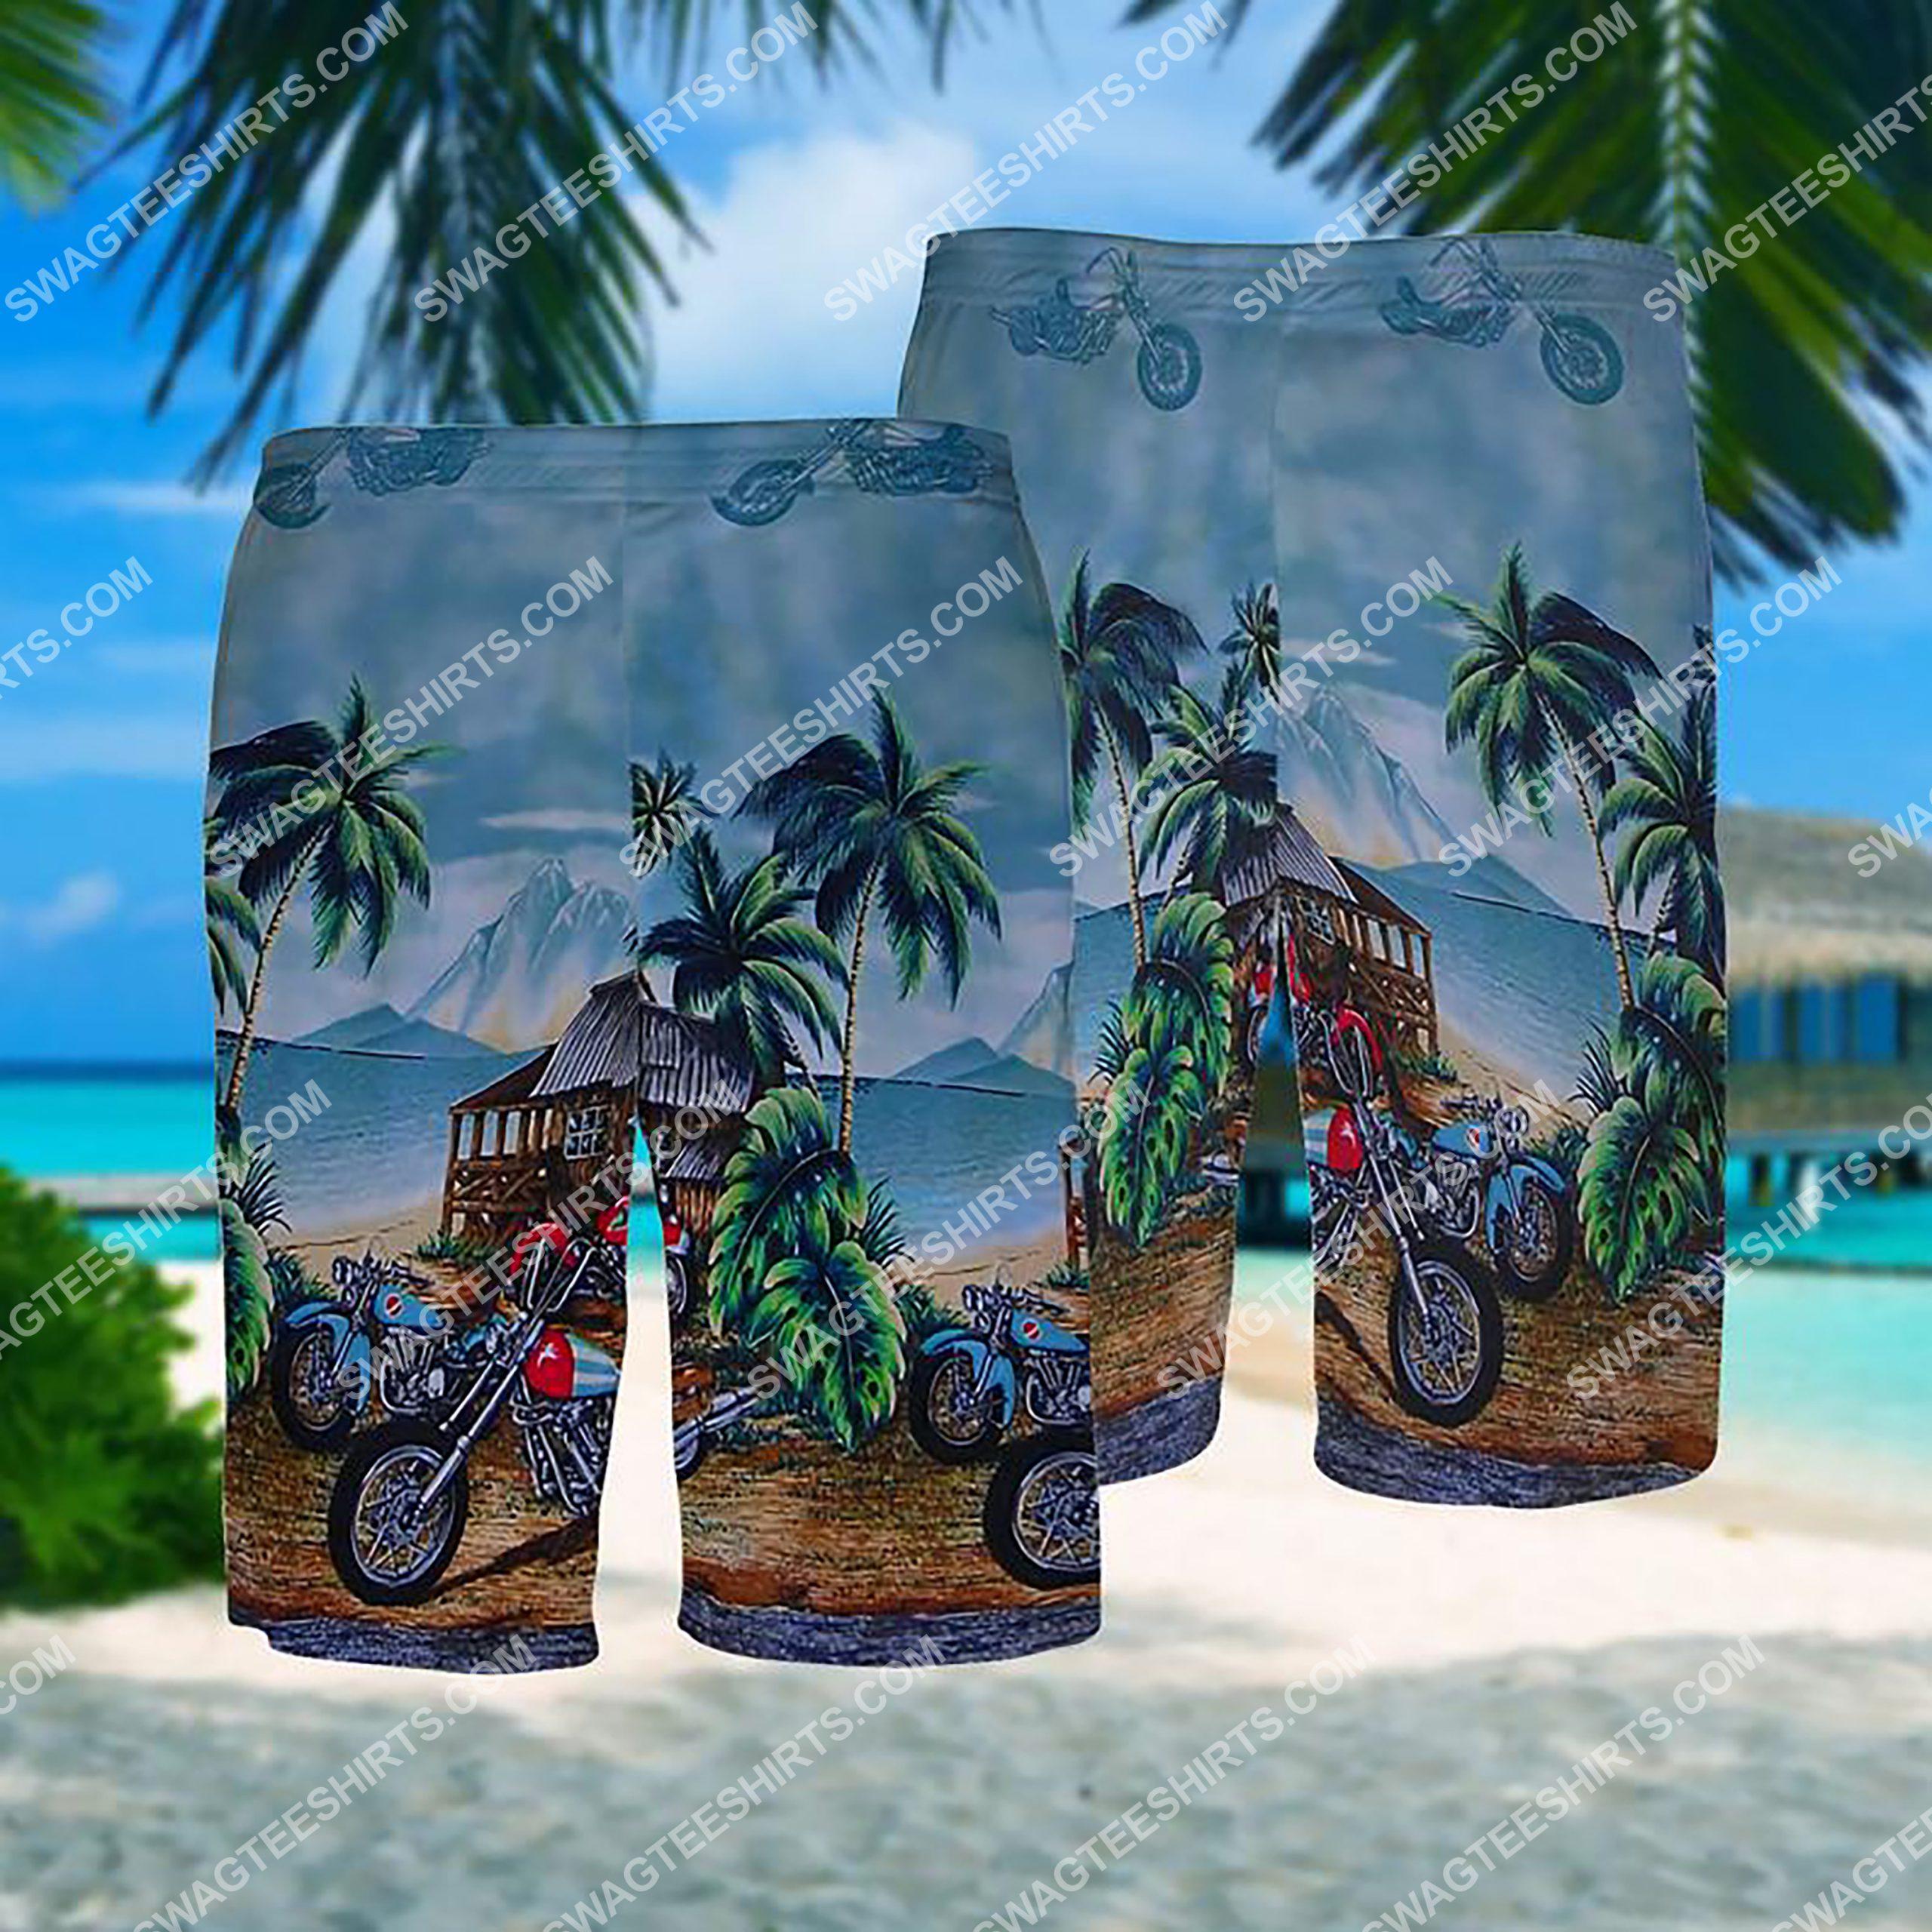 summer time motorcycle all over print hawaiian shorts 1 - Copy